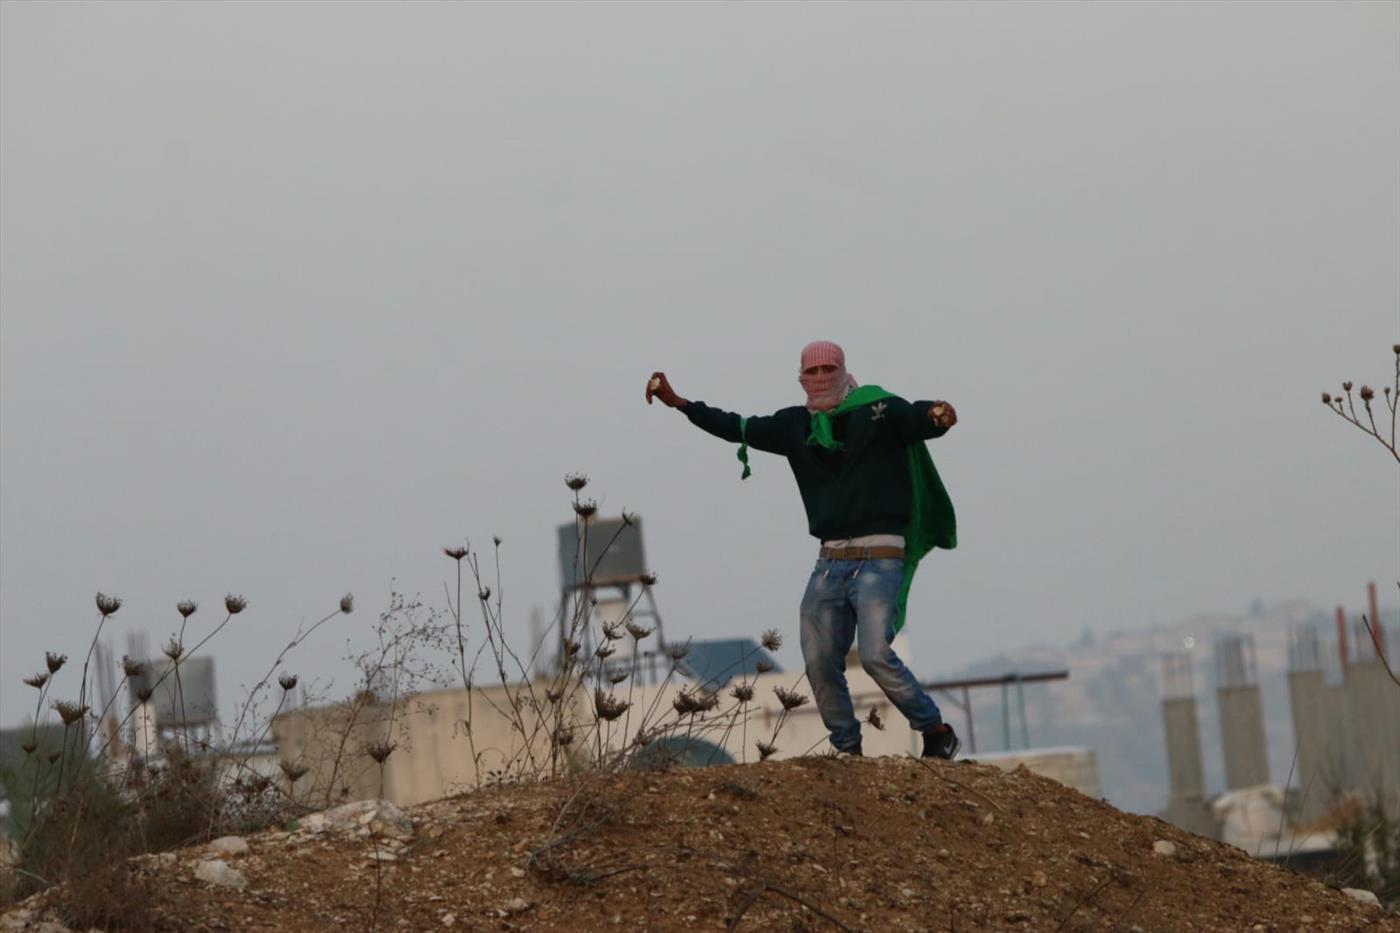 More than 20 Arab Terrorist Attacks on Jews Since the Start of 5781 • הקול היהודי